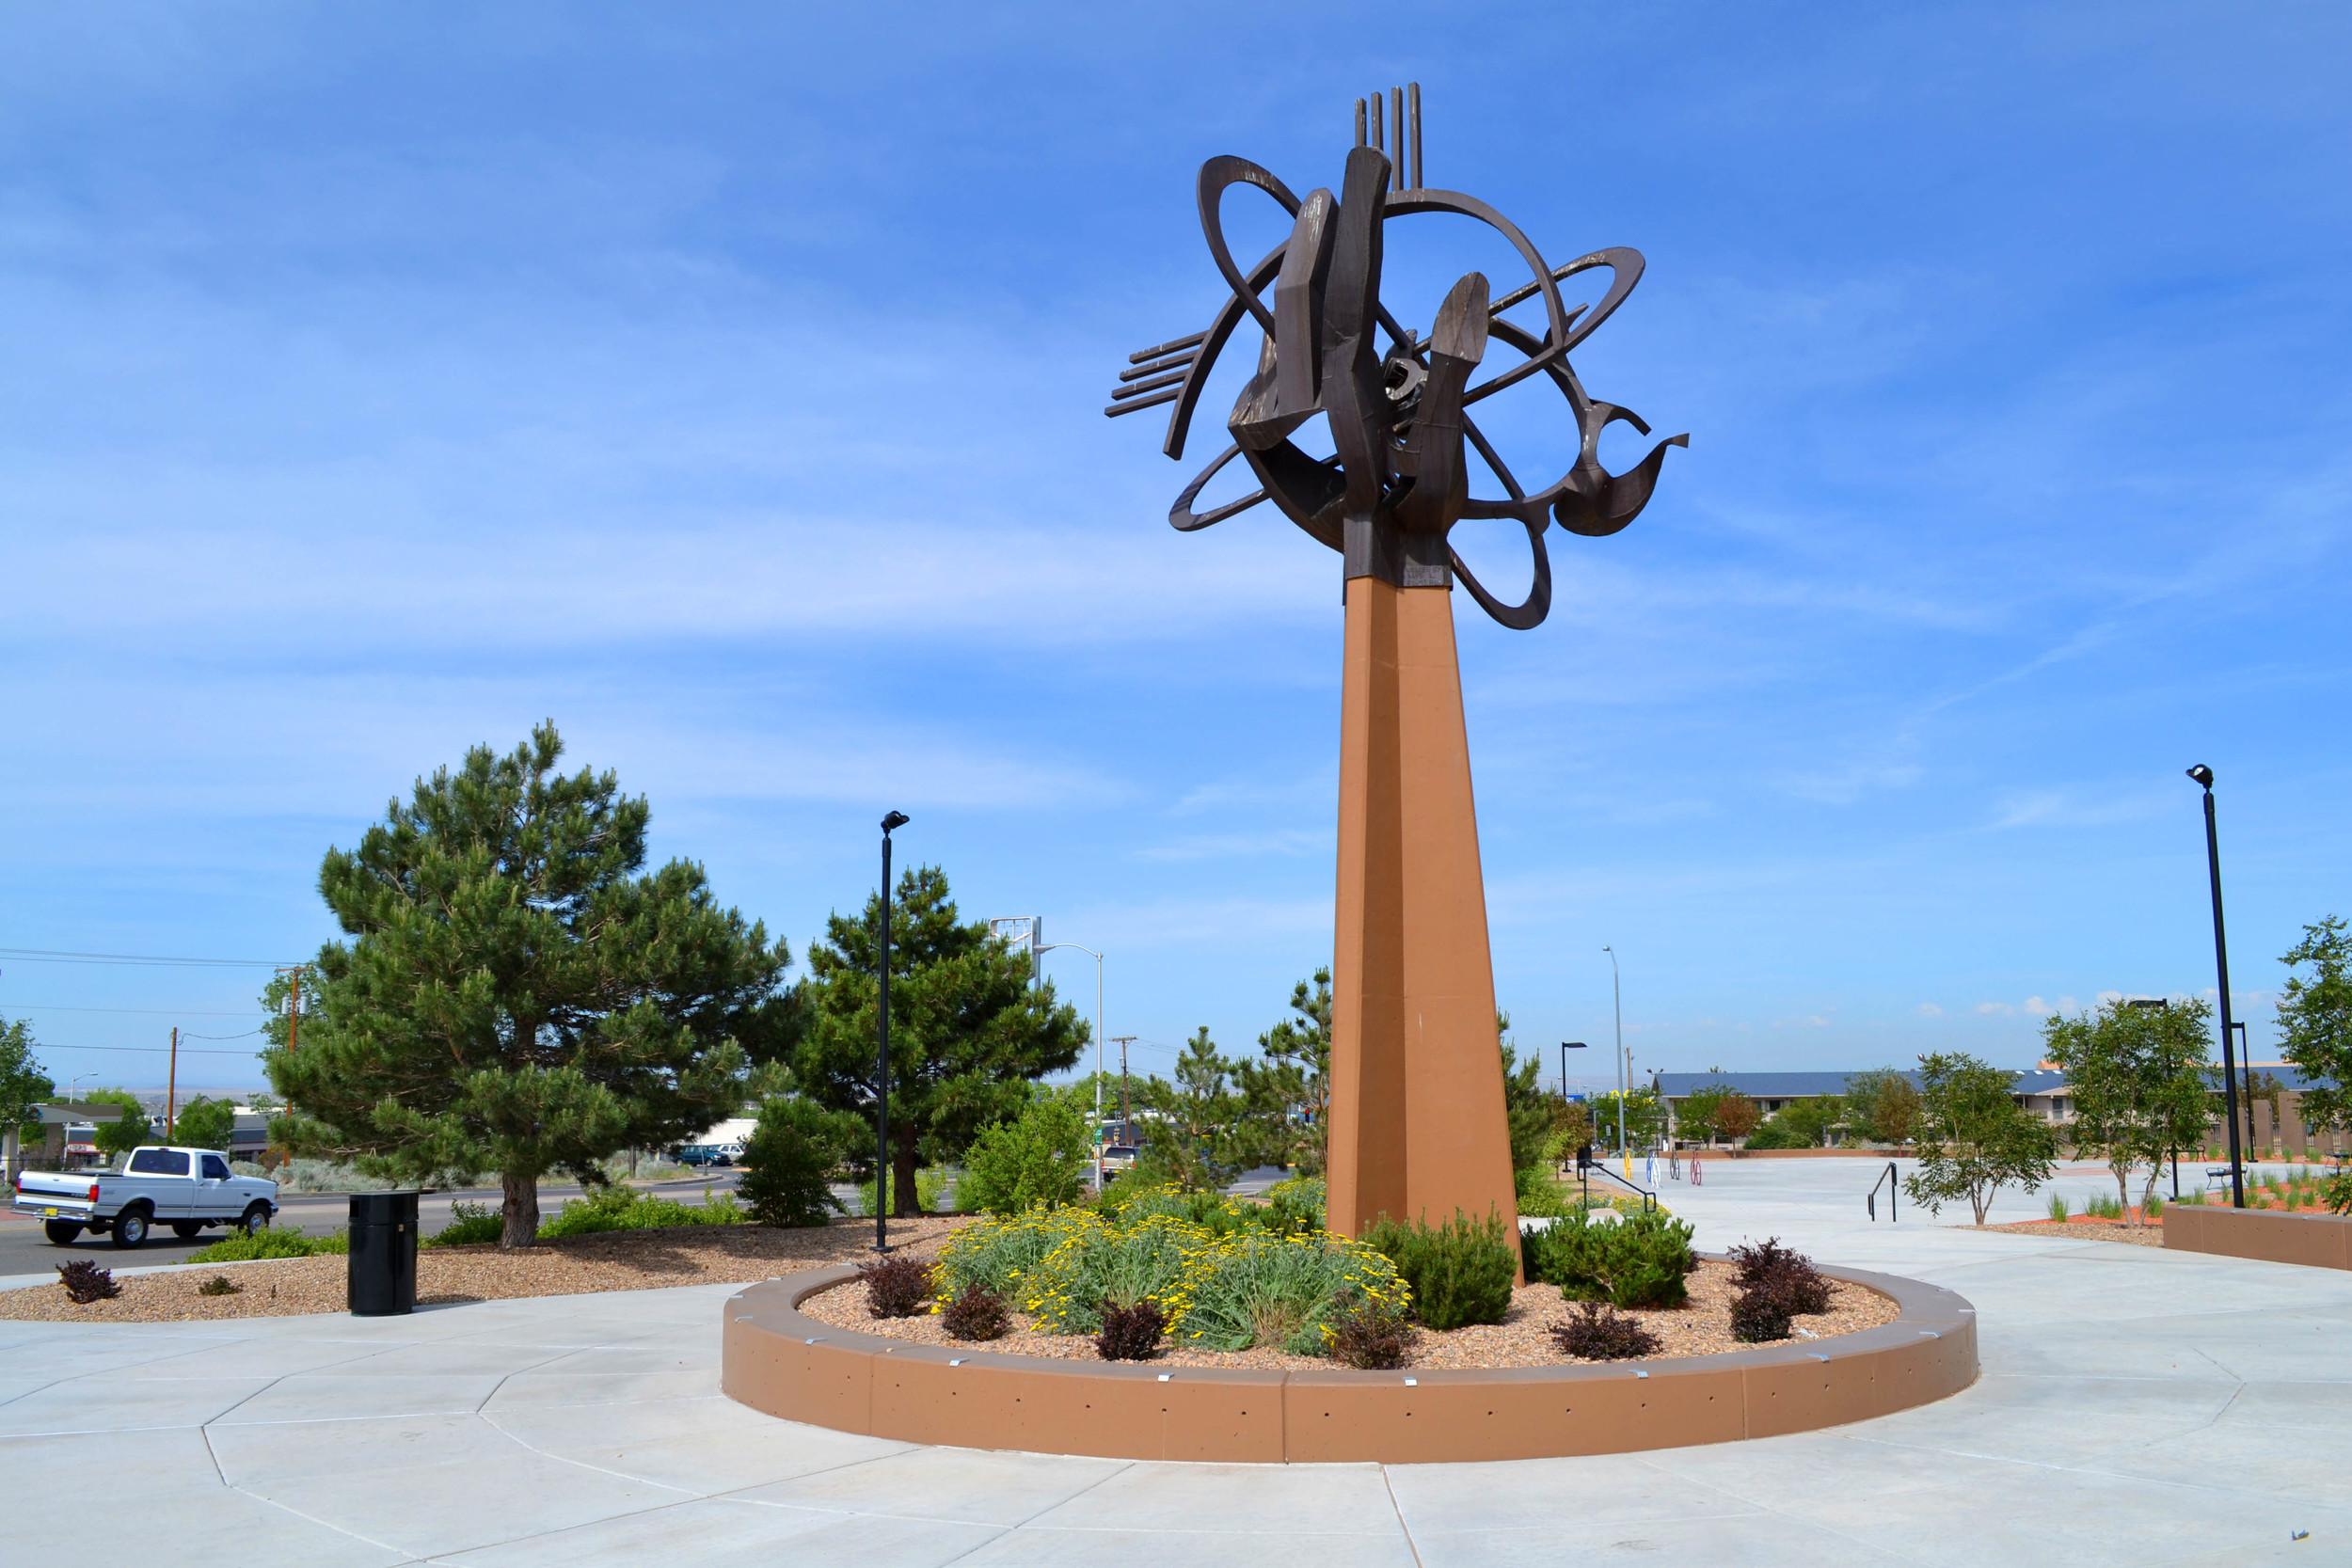 One of Albuquerque's many public art pieces enlivens the park